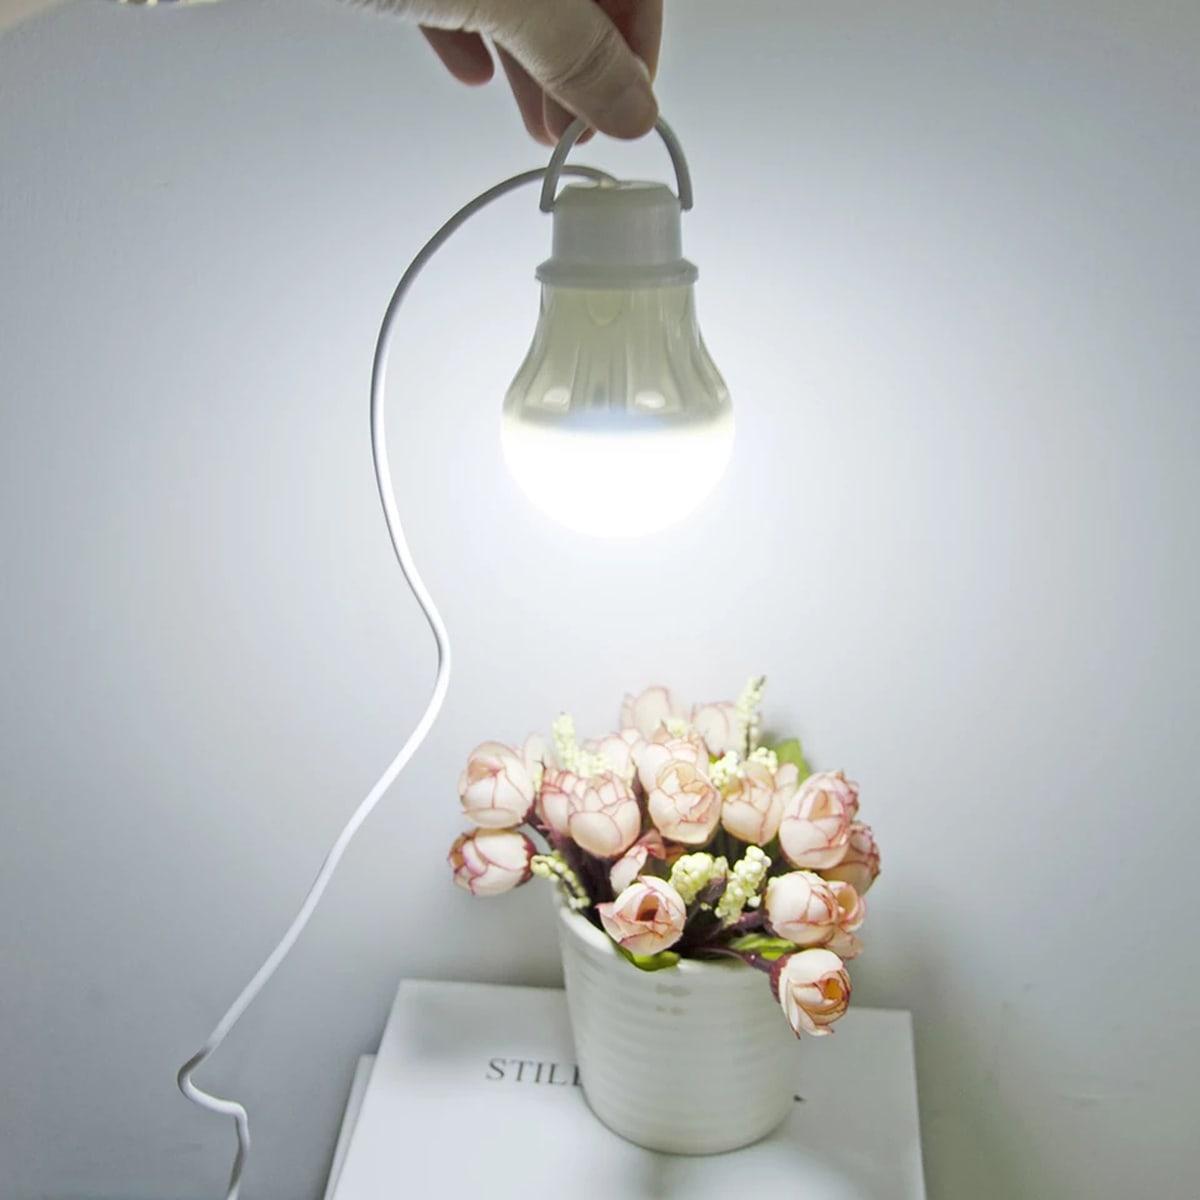 1 Stück hängende LED-Glühbirne